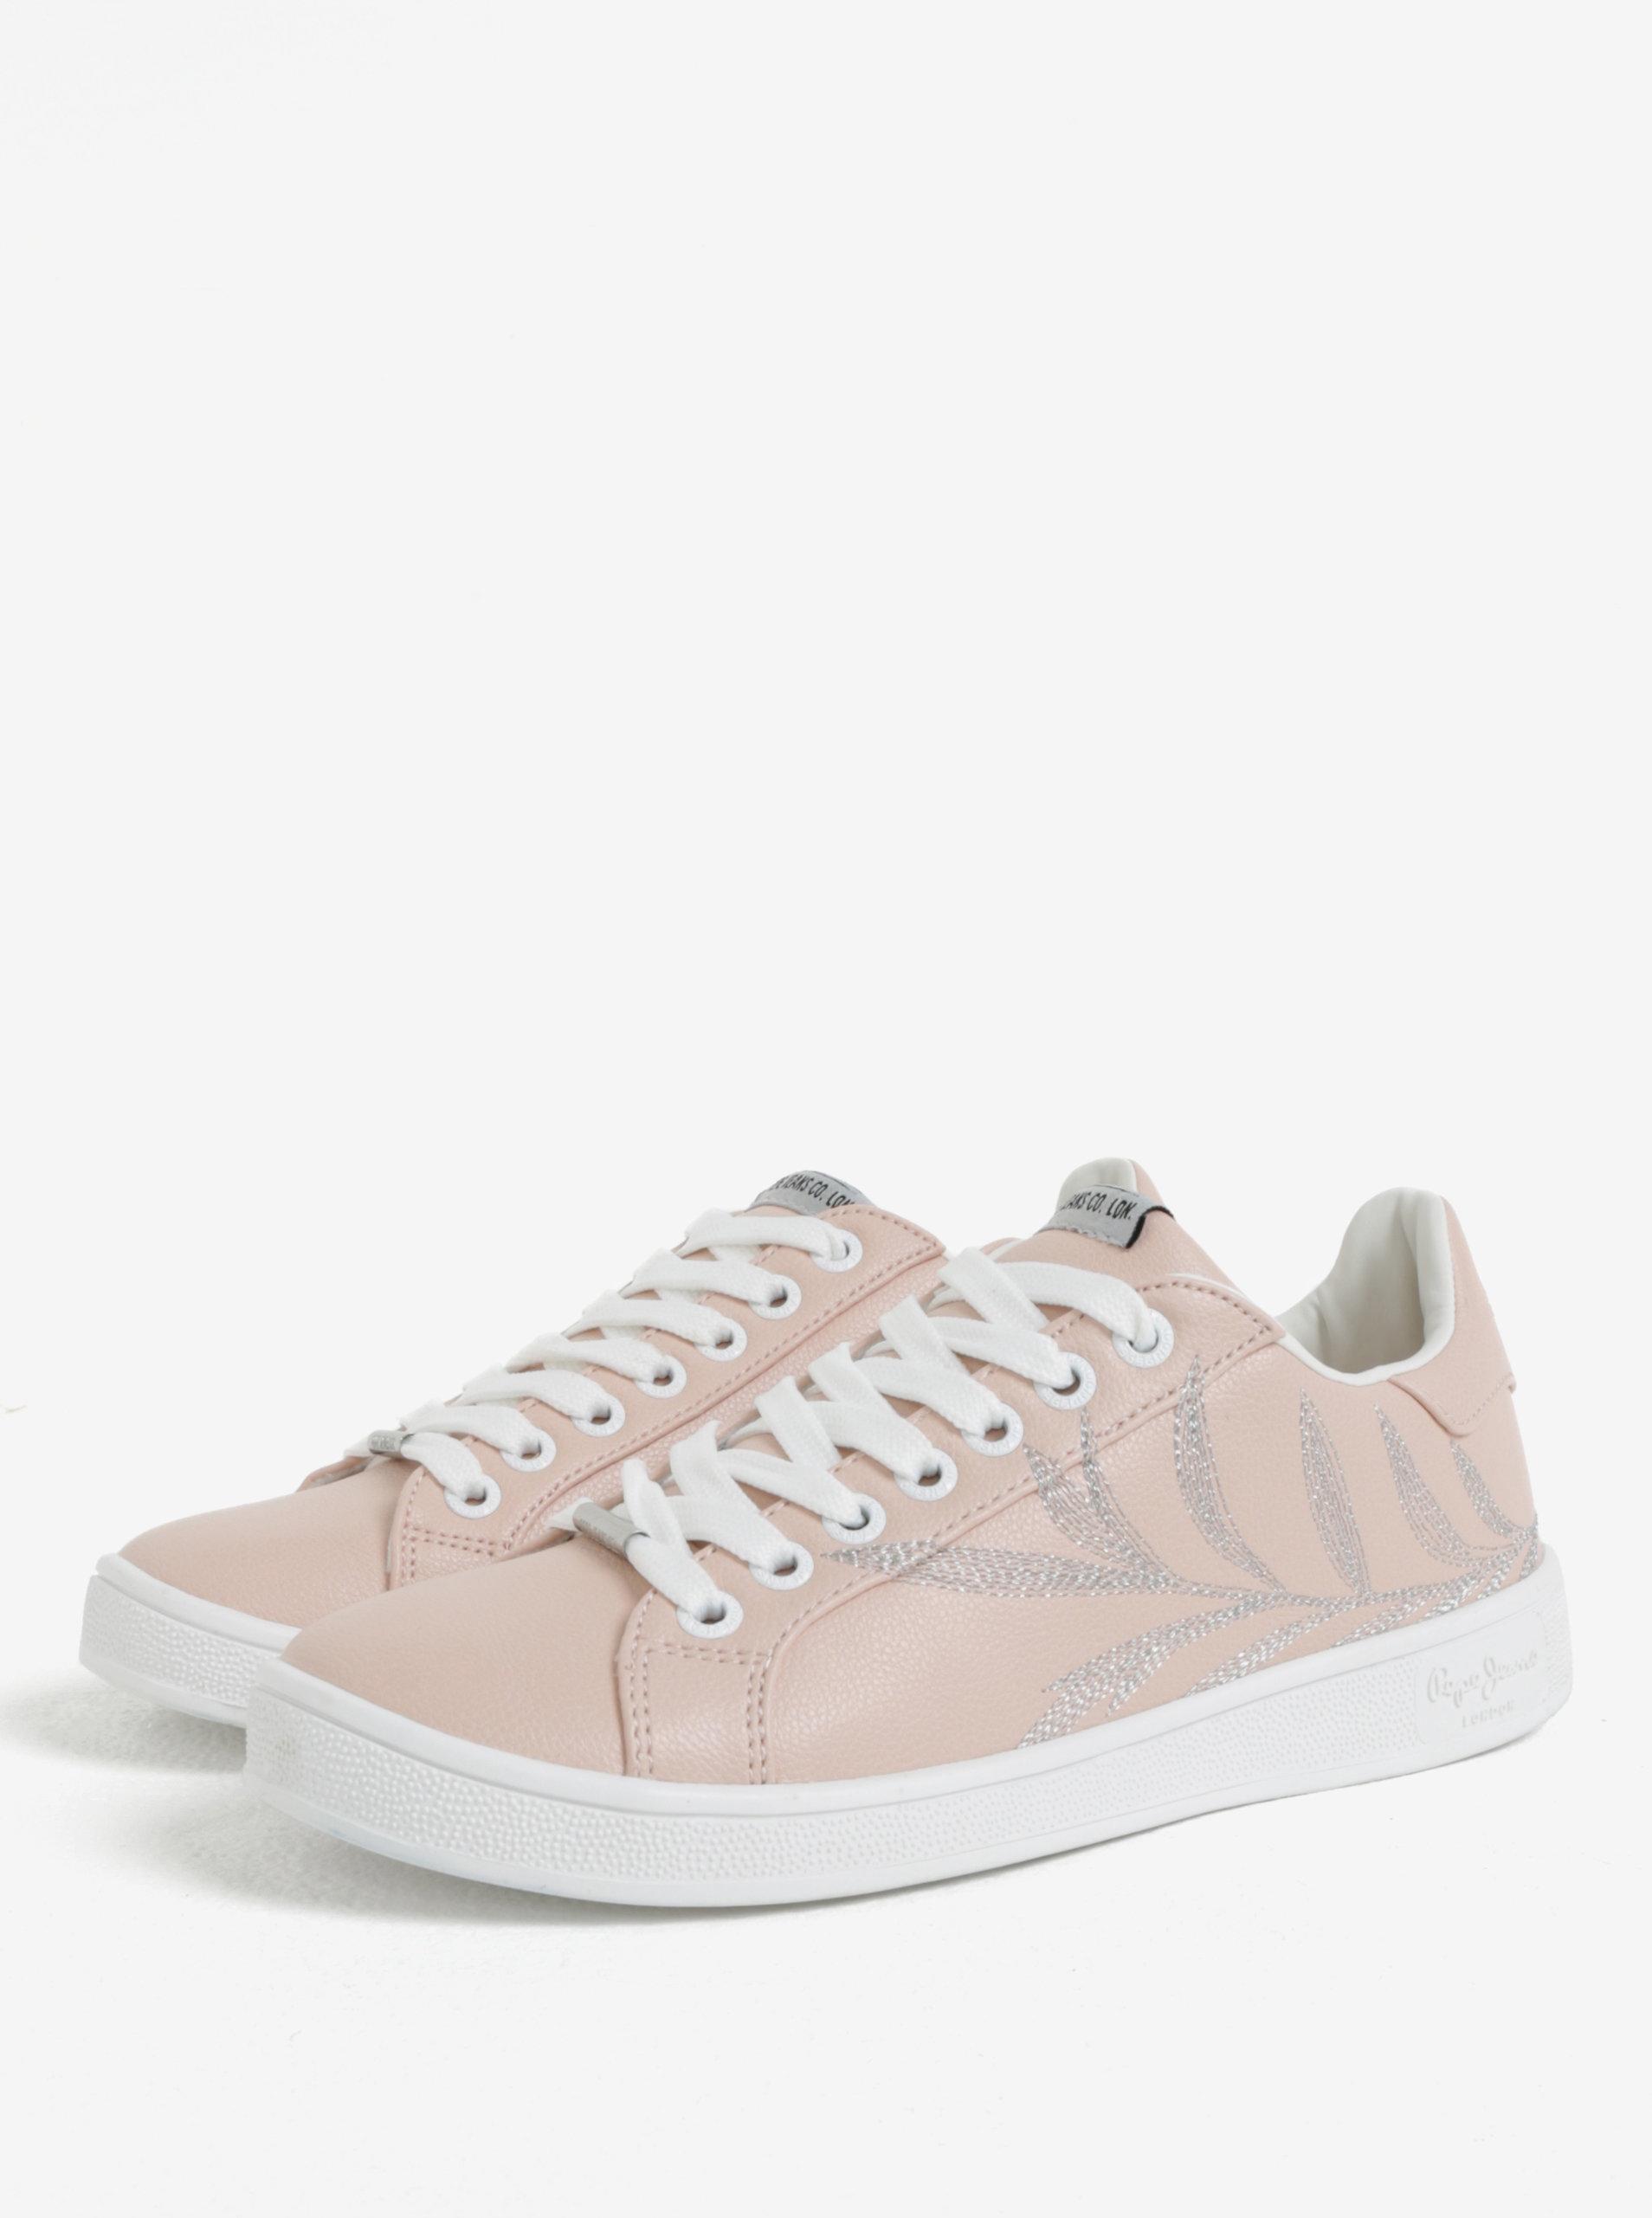 195ed52c65338 Bielo-ružové dámske tenisky Pepe Jeans Brompton Embroidery   ZOOT.sk